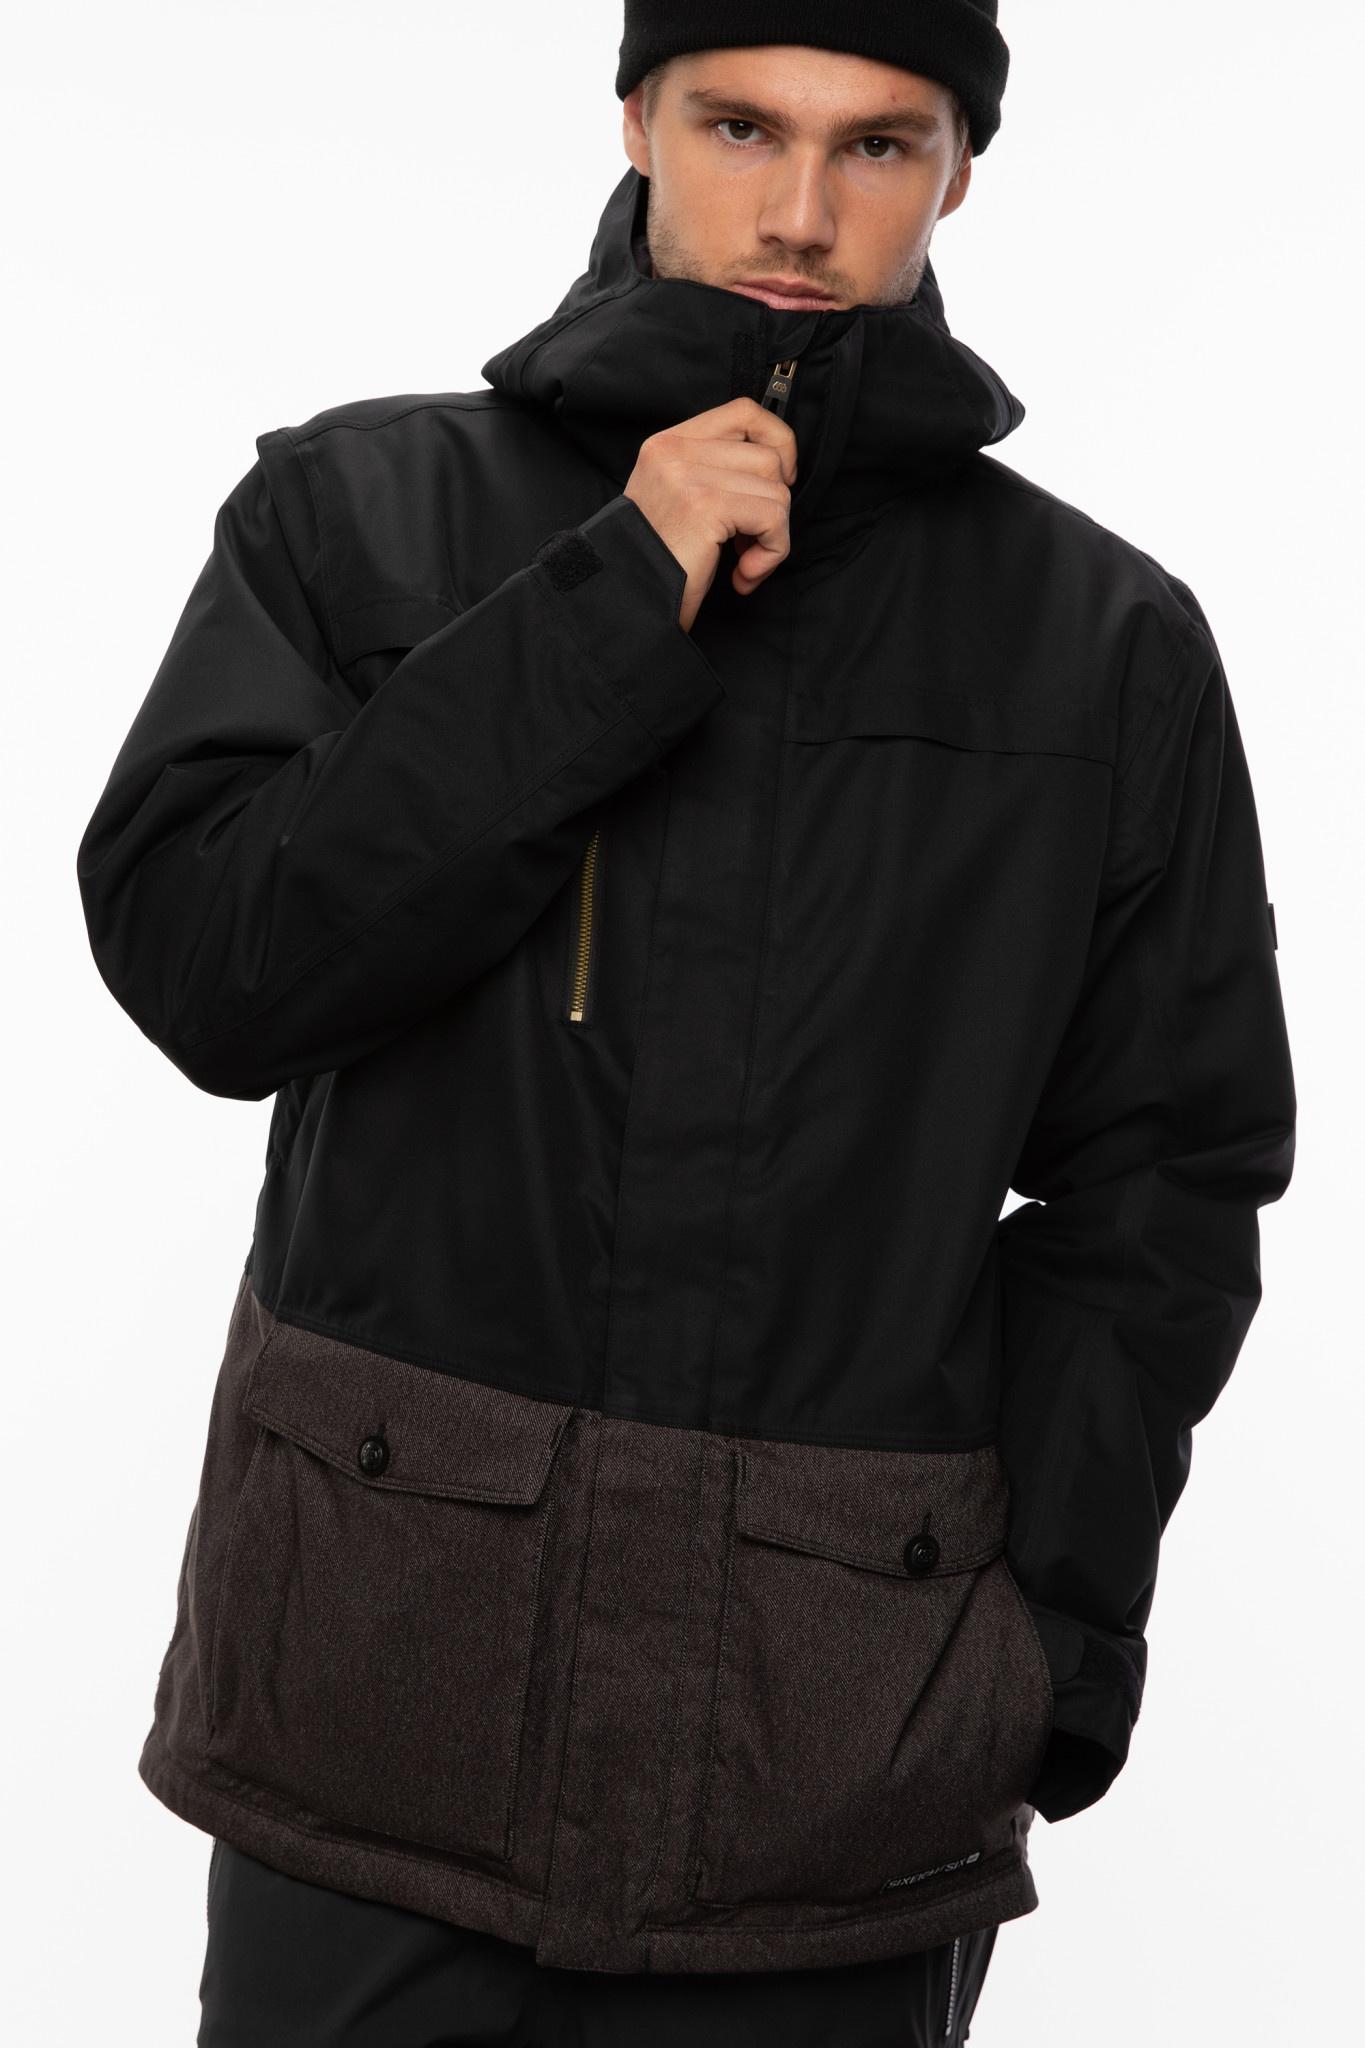 686 686 M's Anthem Insulated Jacket